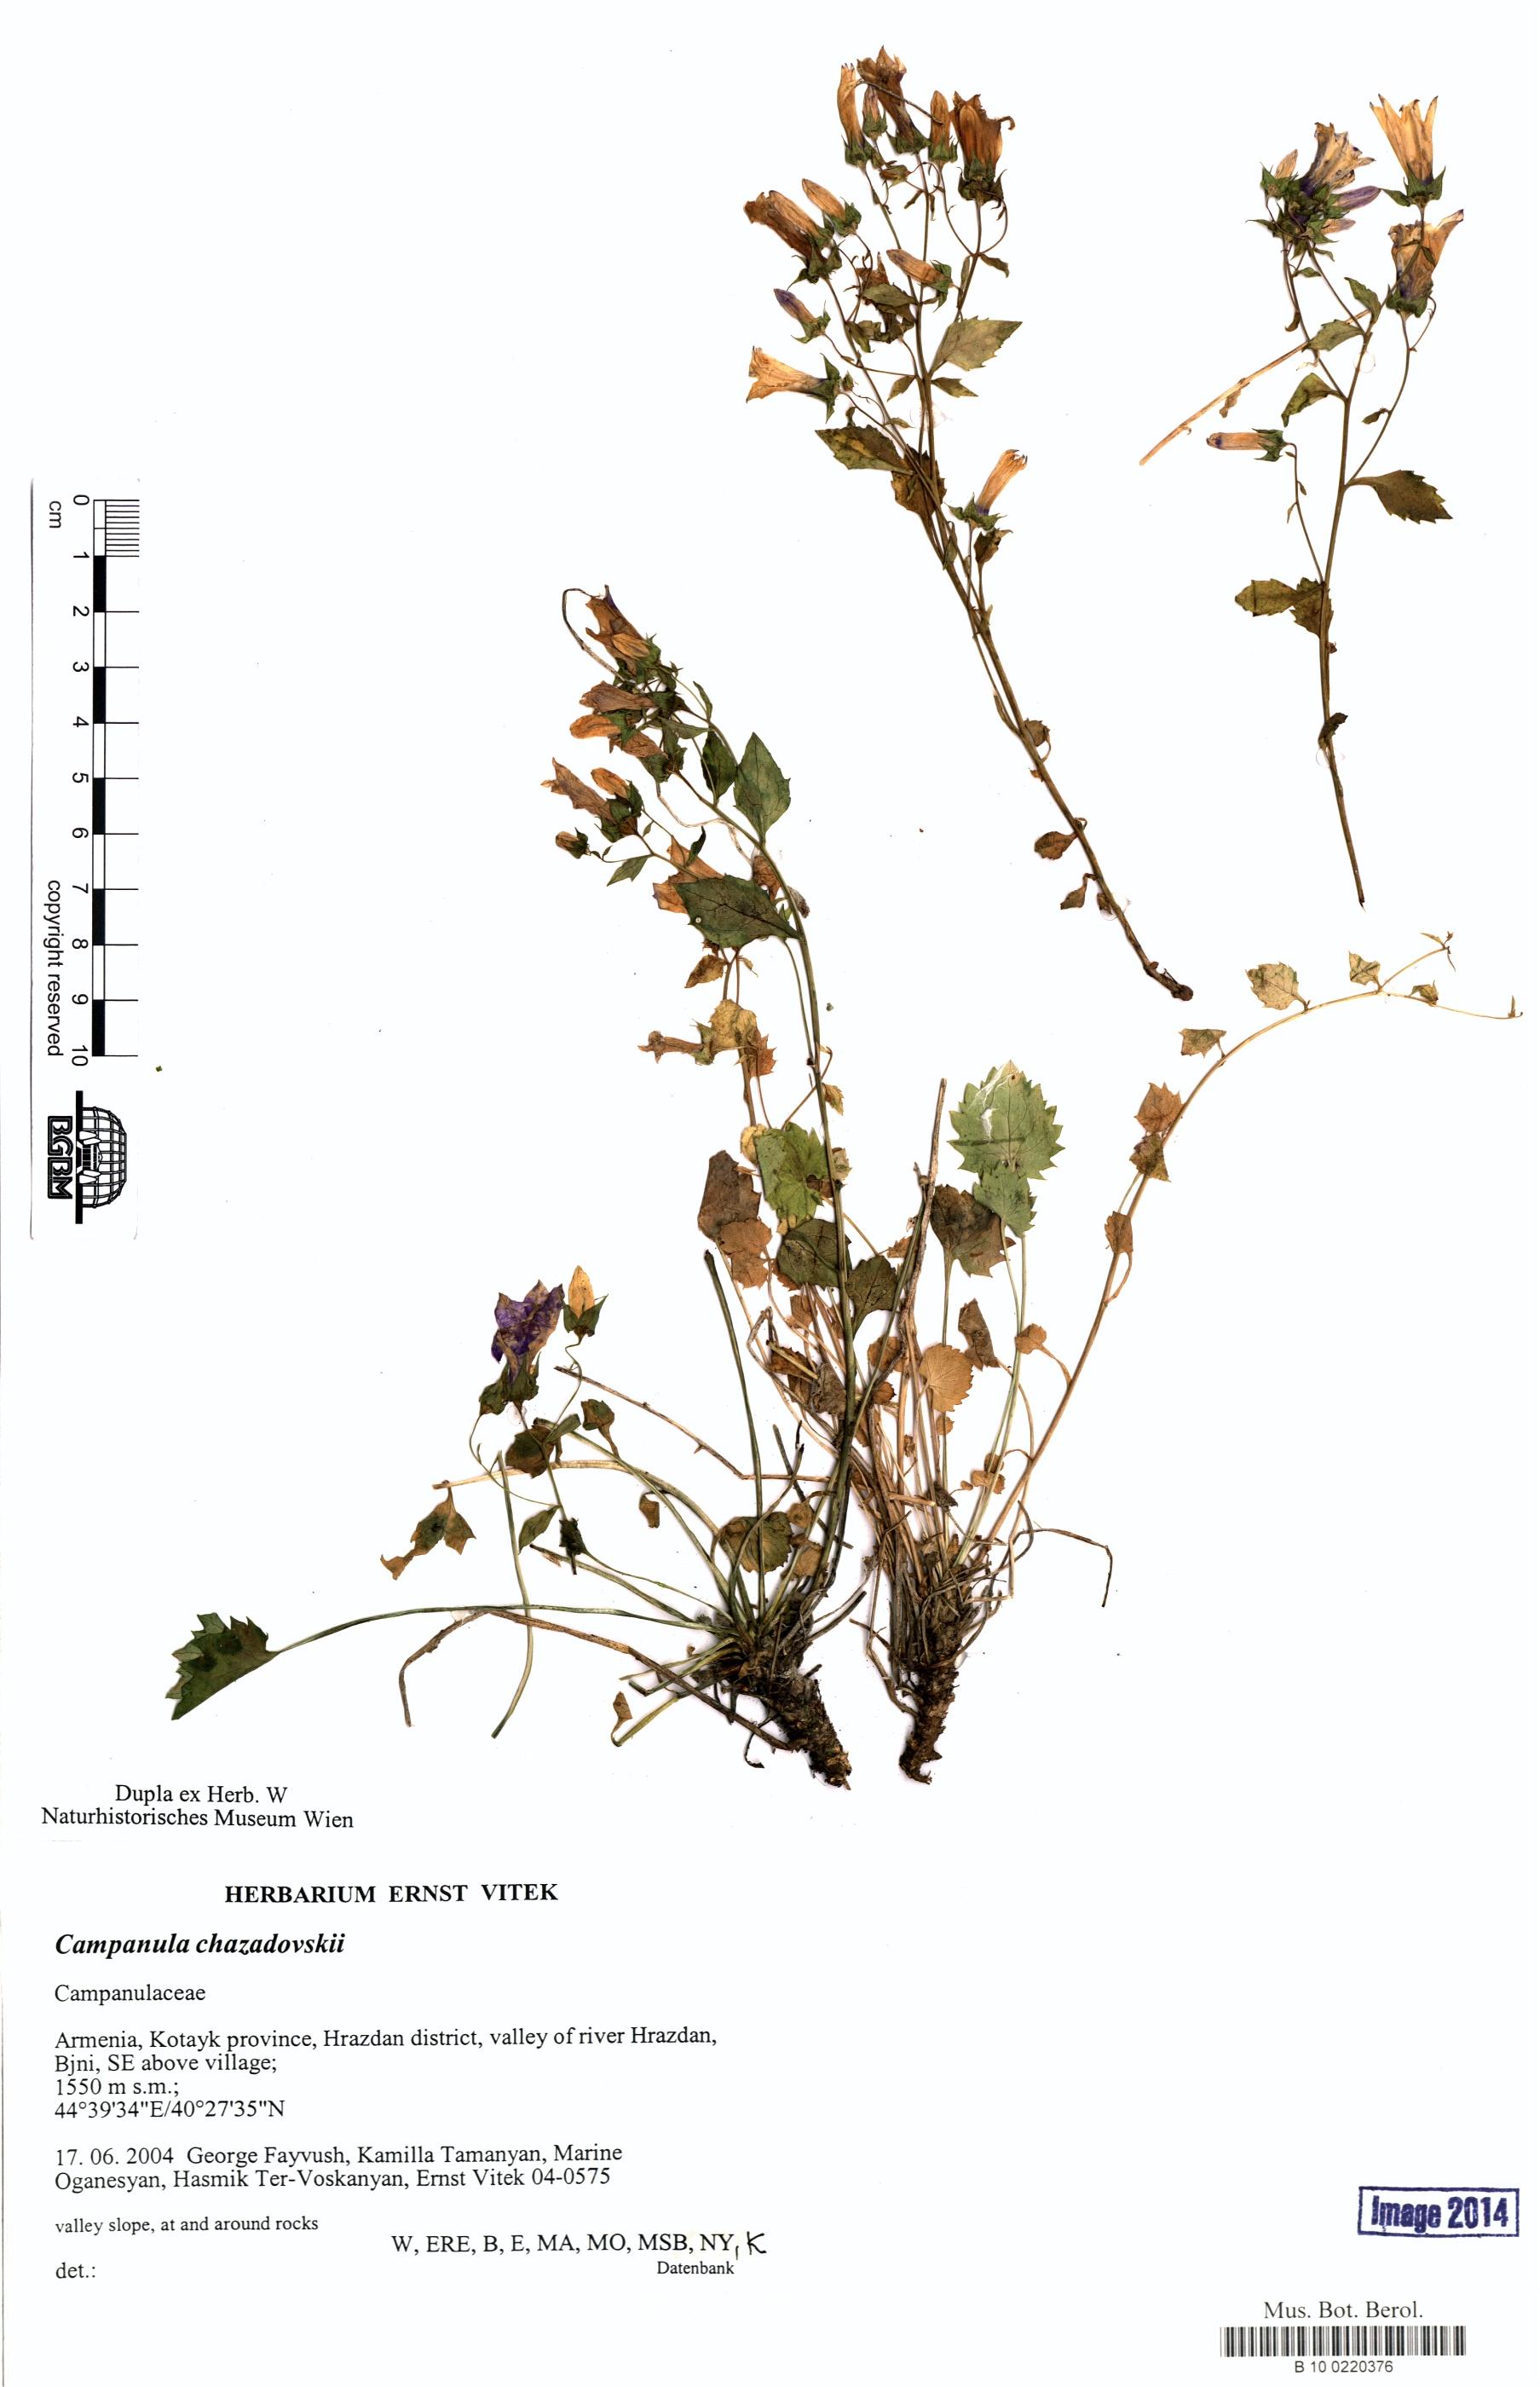 http://ww2.bgbm.org/herbarium/images/B/10/02/20/37/B_10_0220376.jpg